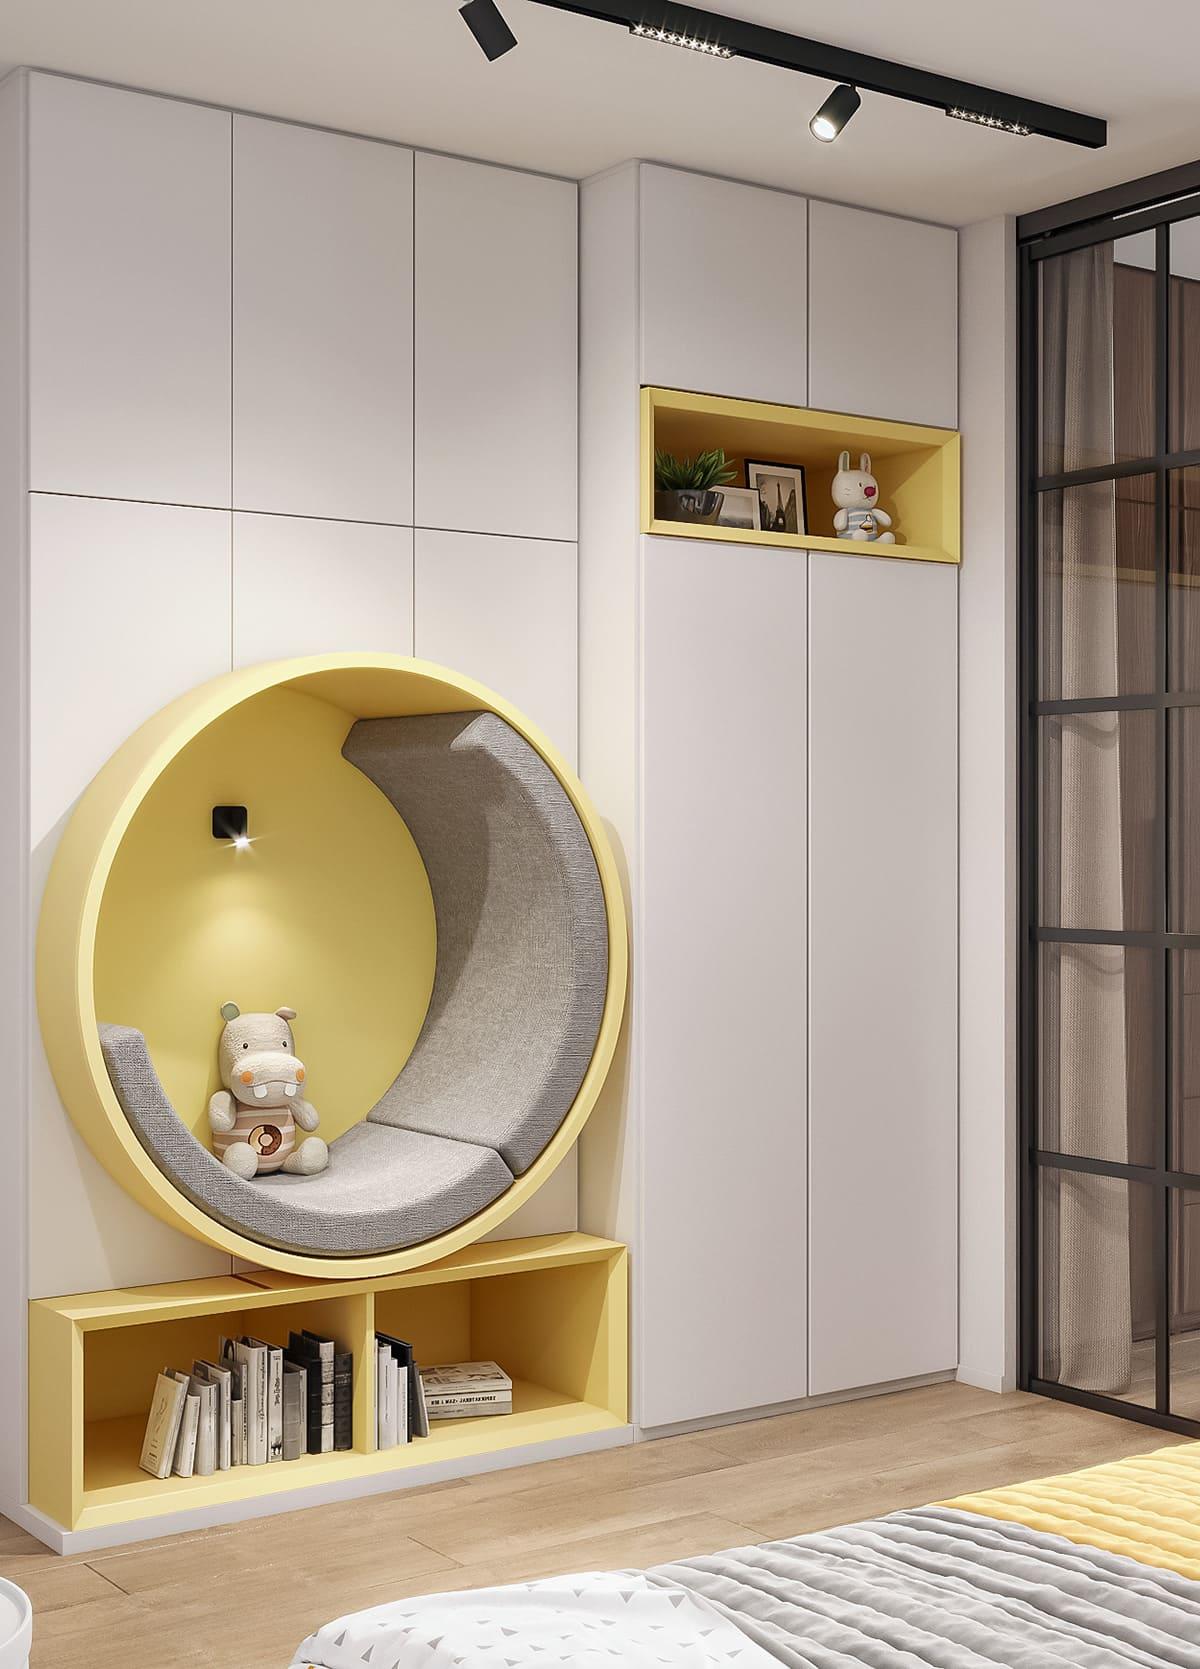 интерьер детской комнаты фото 47